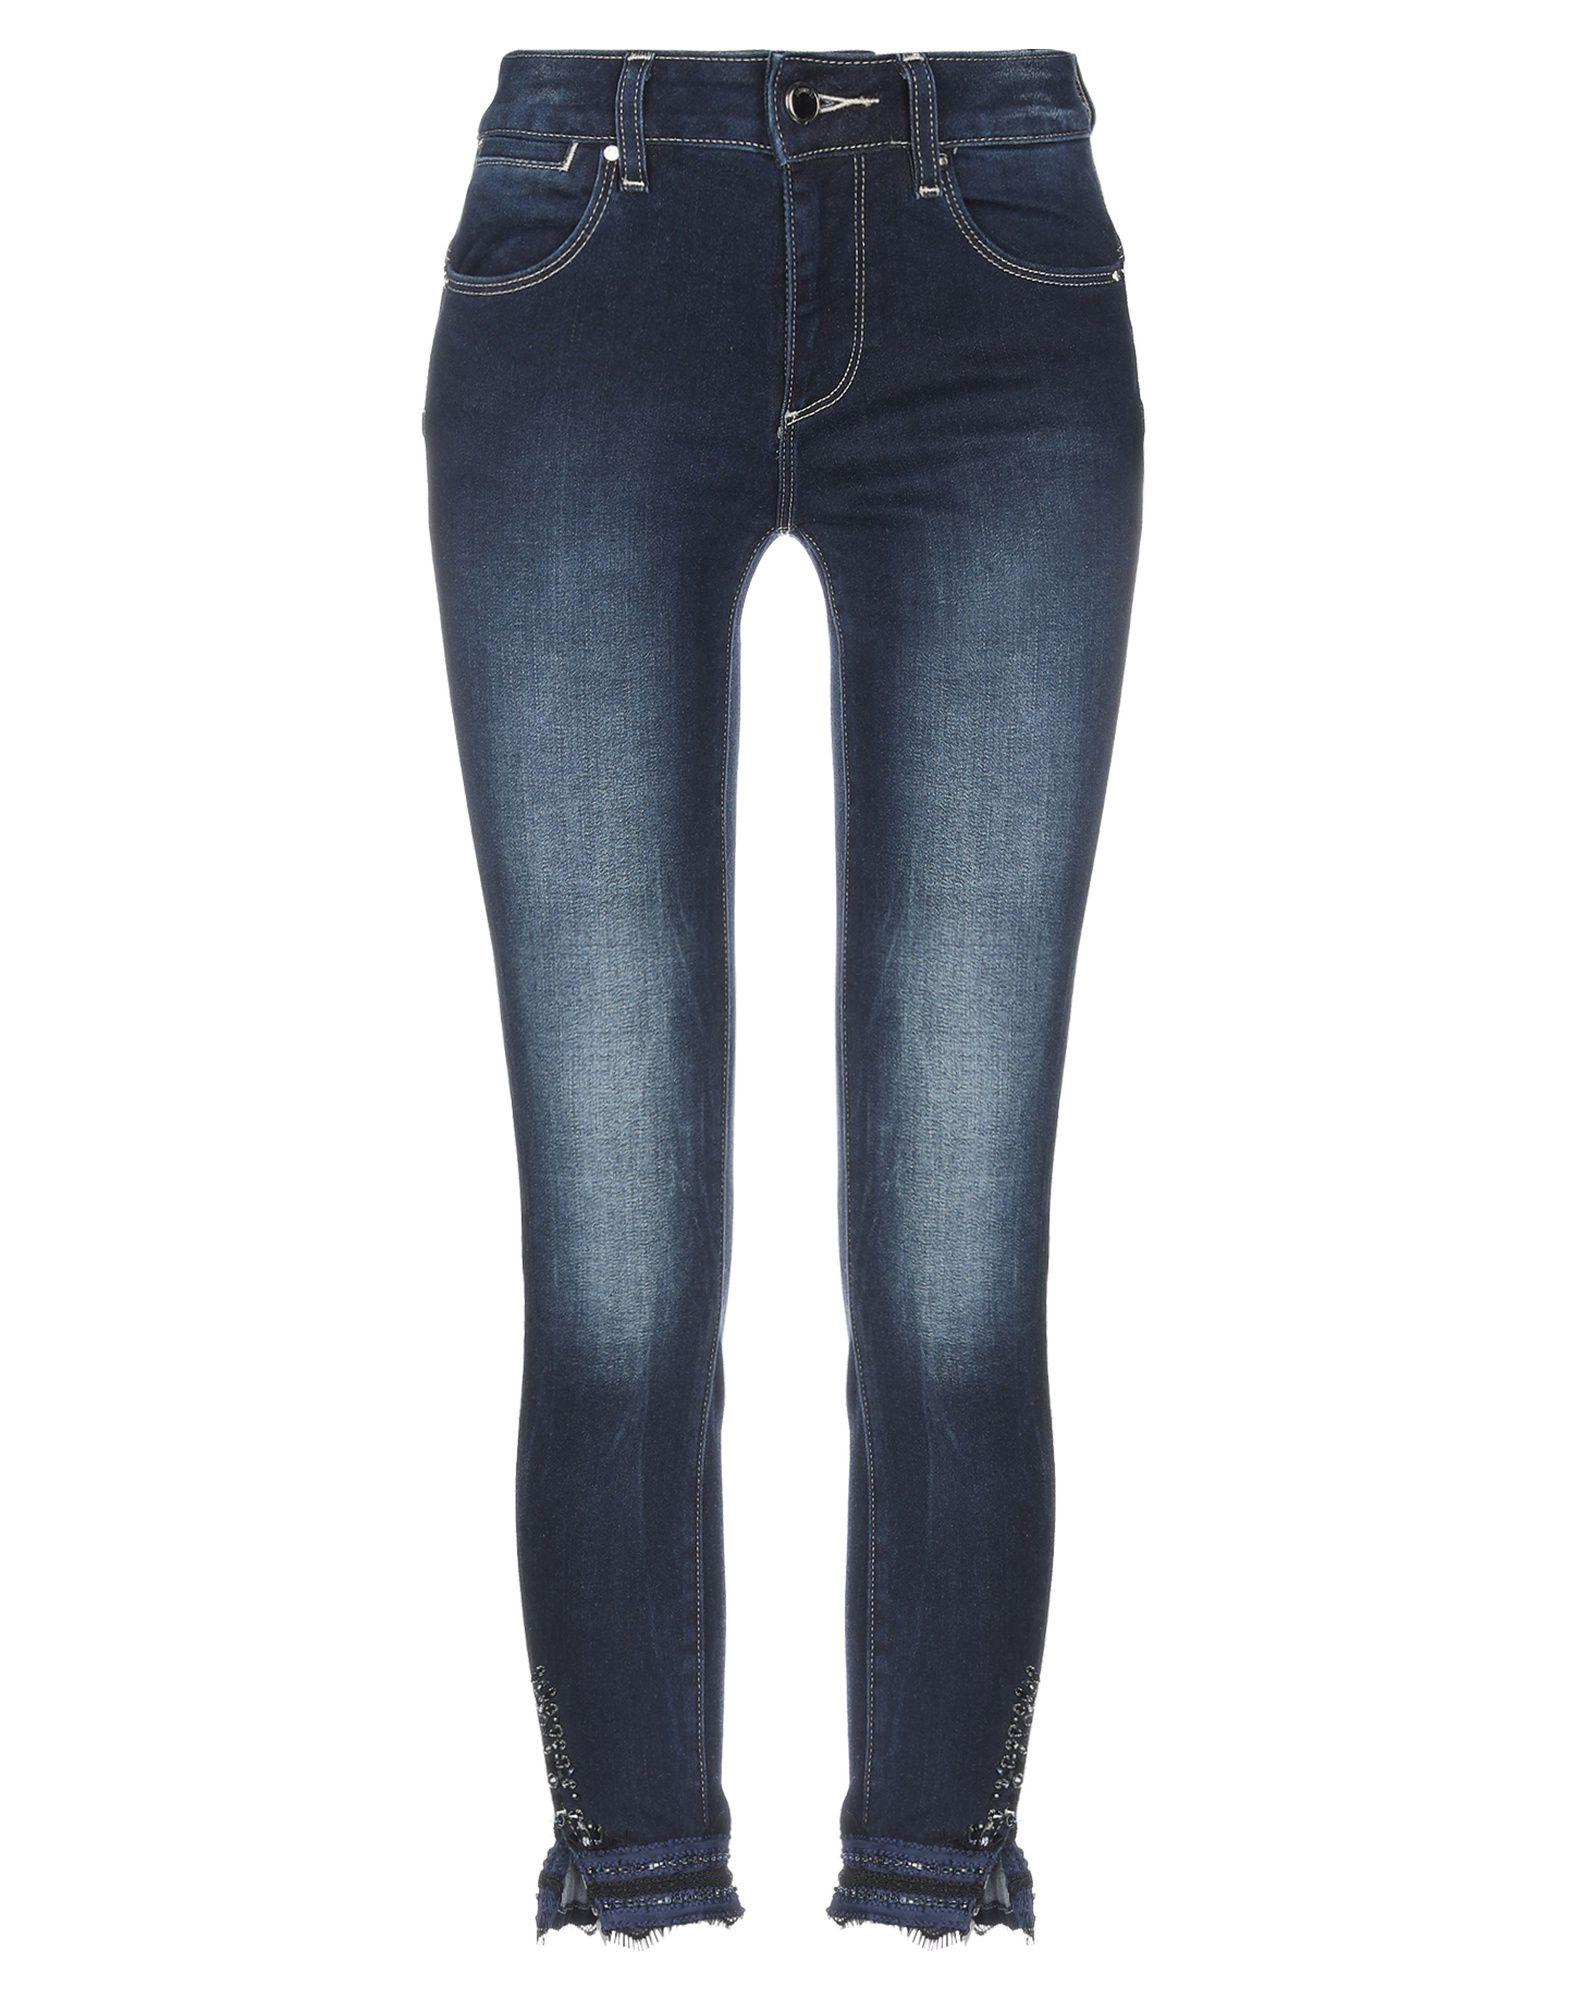 Pantaloni Jeans Fracomina Fracomina donna - 42742055JU  Sparen Sie bis zu 30-50%